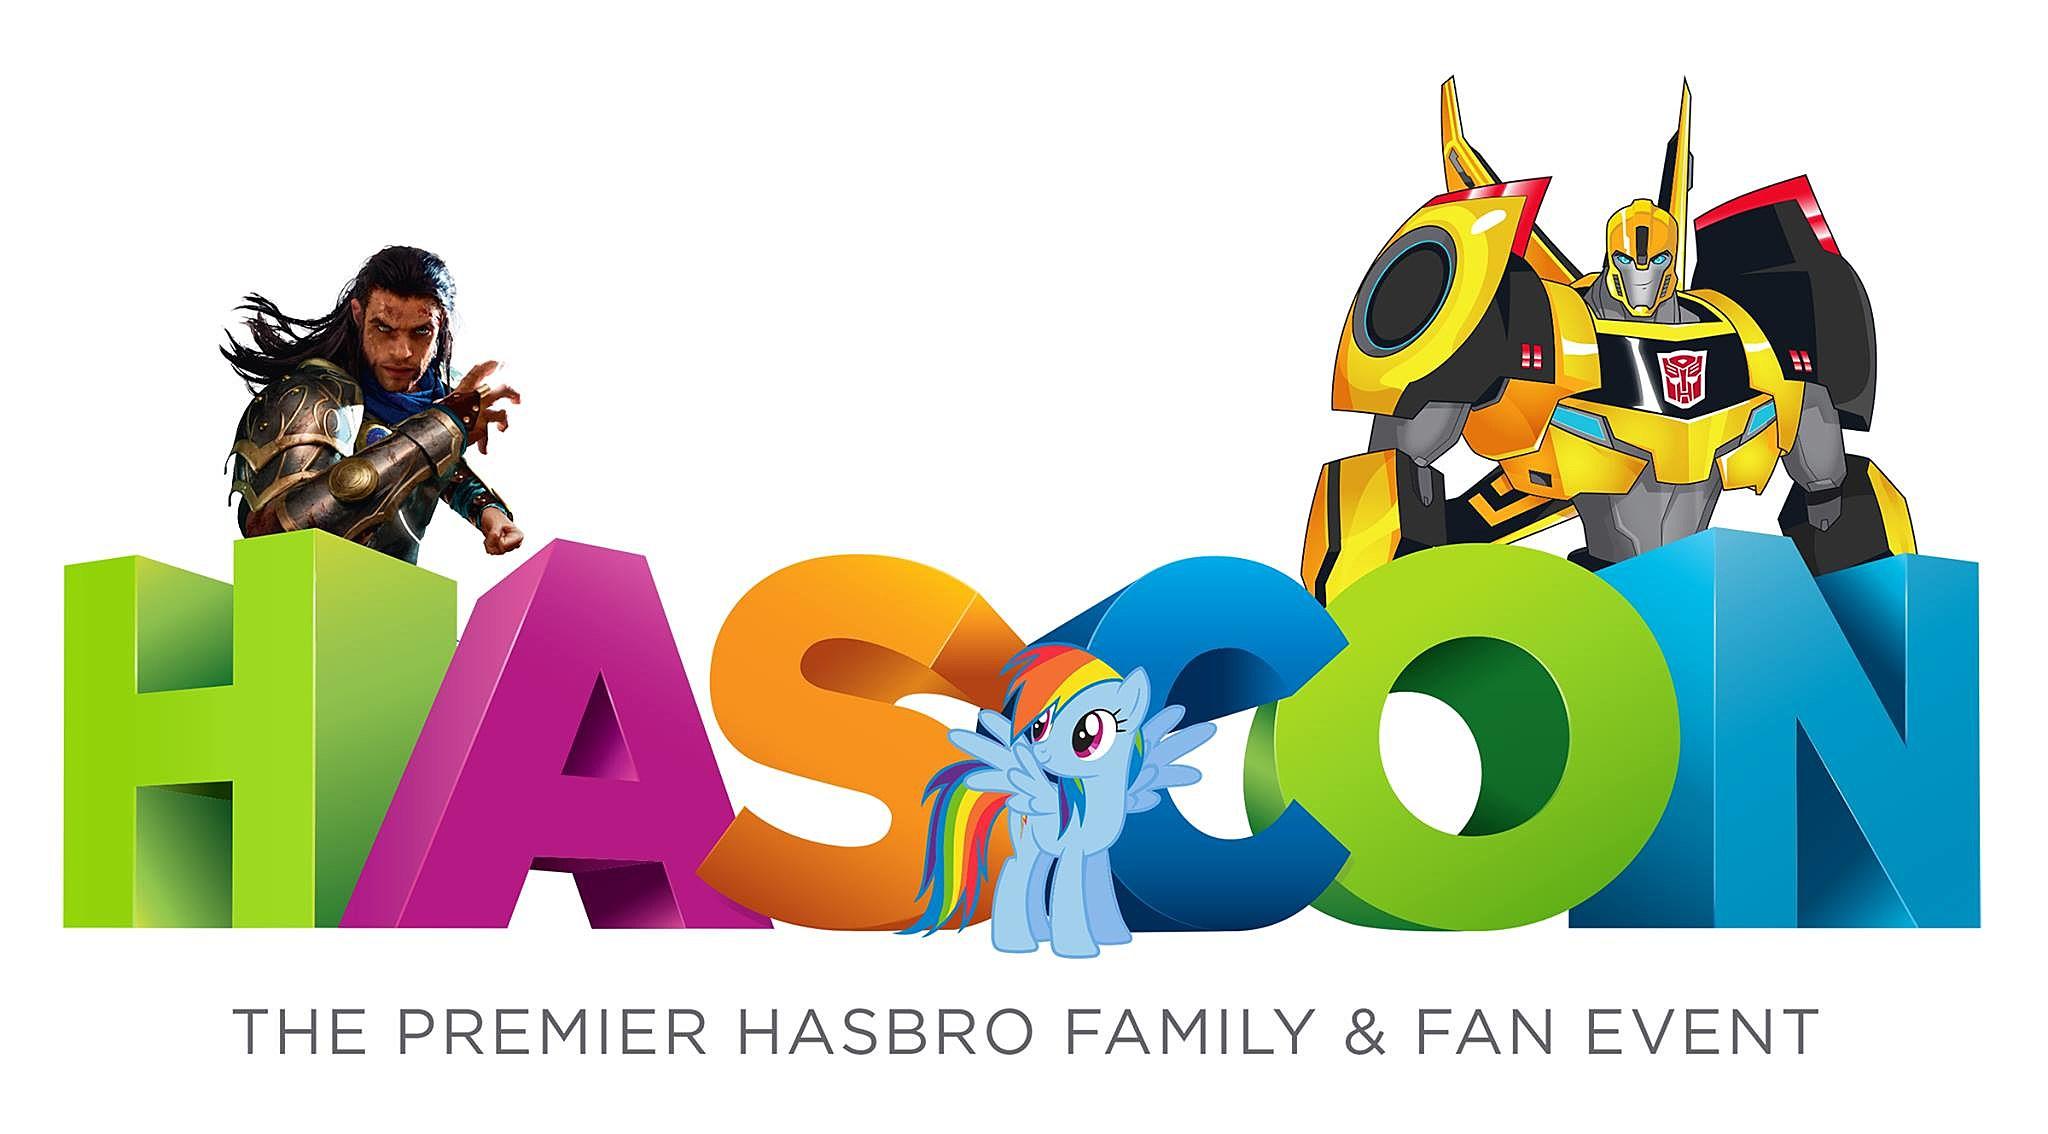 HASCON Facebook Event